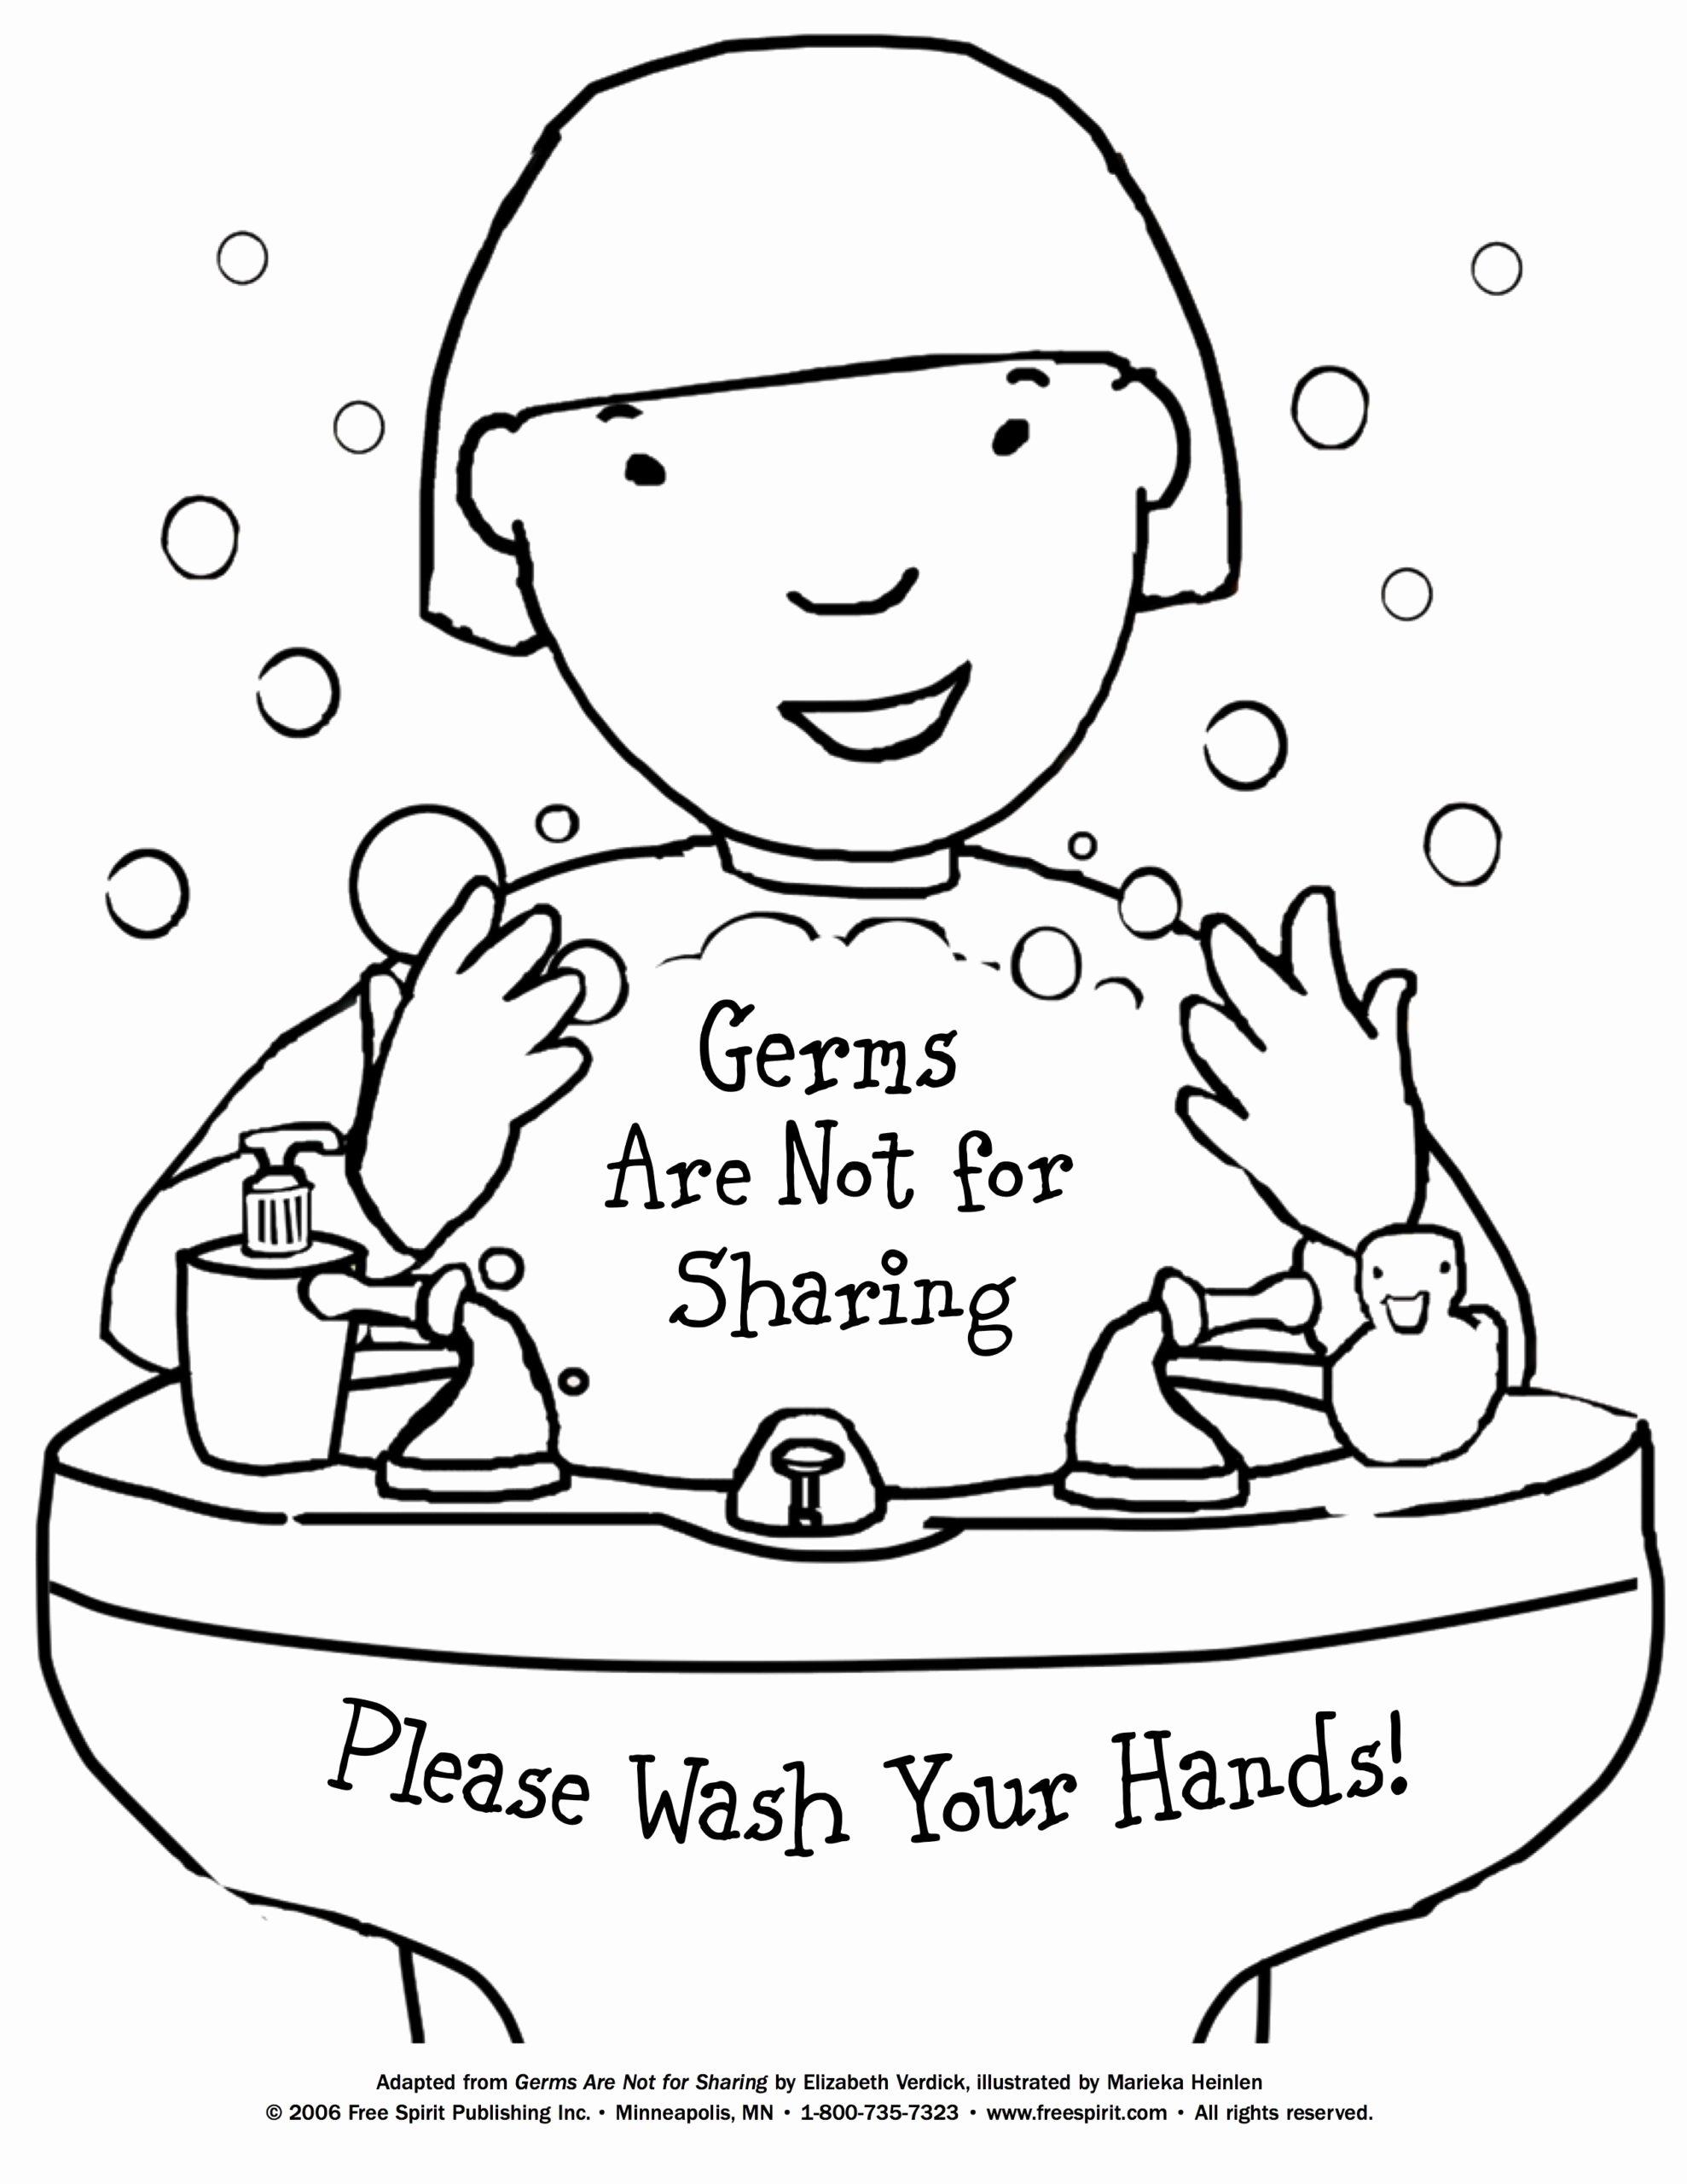 Sharing Worksheets for Preschoolers Best Of Worksheets Sharing Coloring for Preschoolers Free Writing